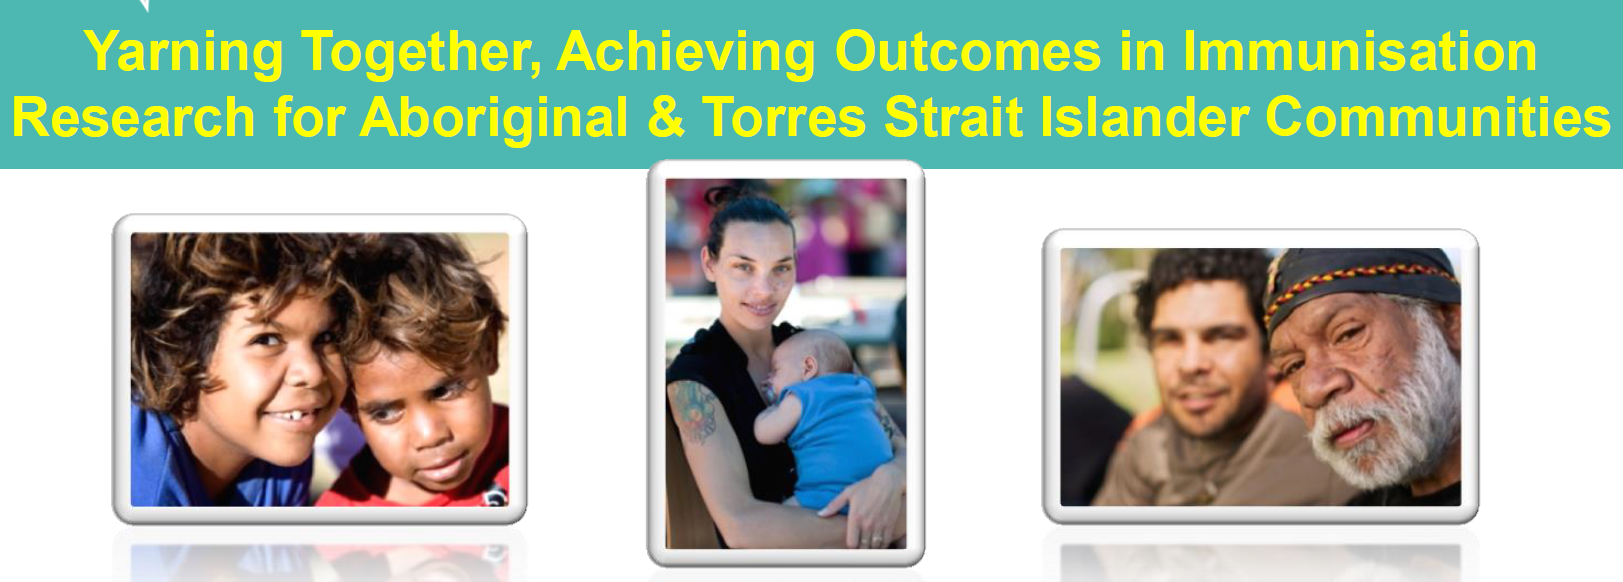 Yarning Together: a workshop on immunisation research for Aboriginal & Torres Strait Islander communities